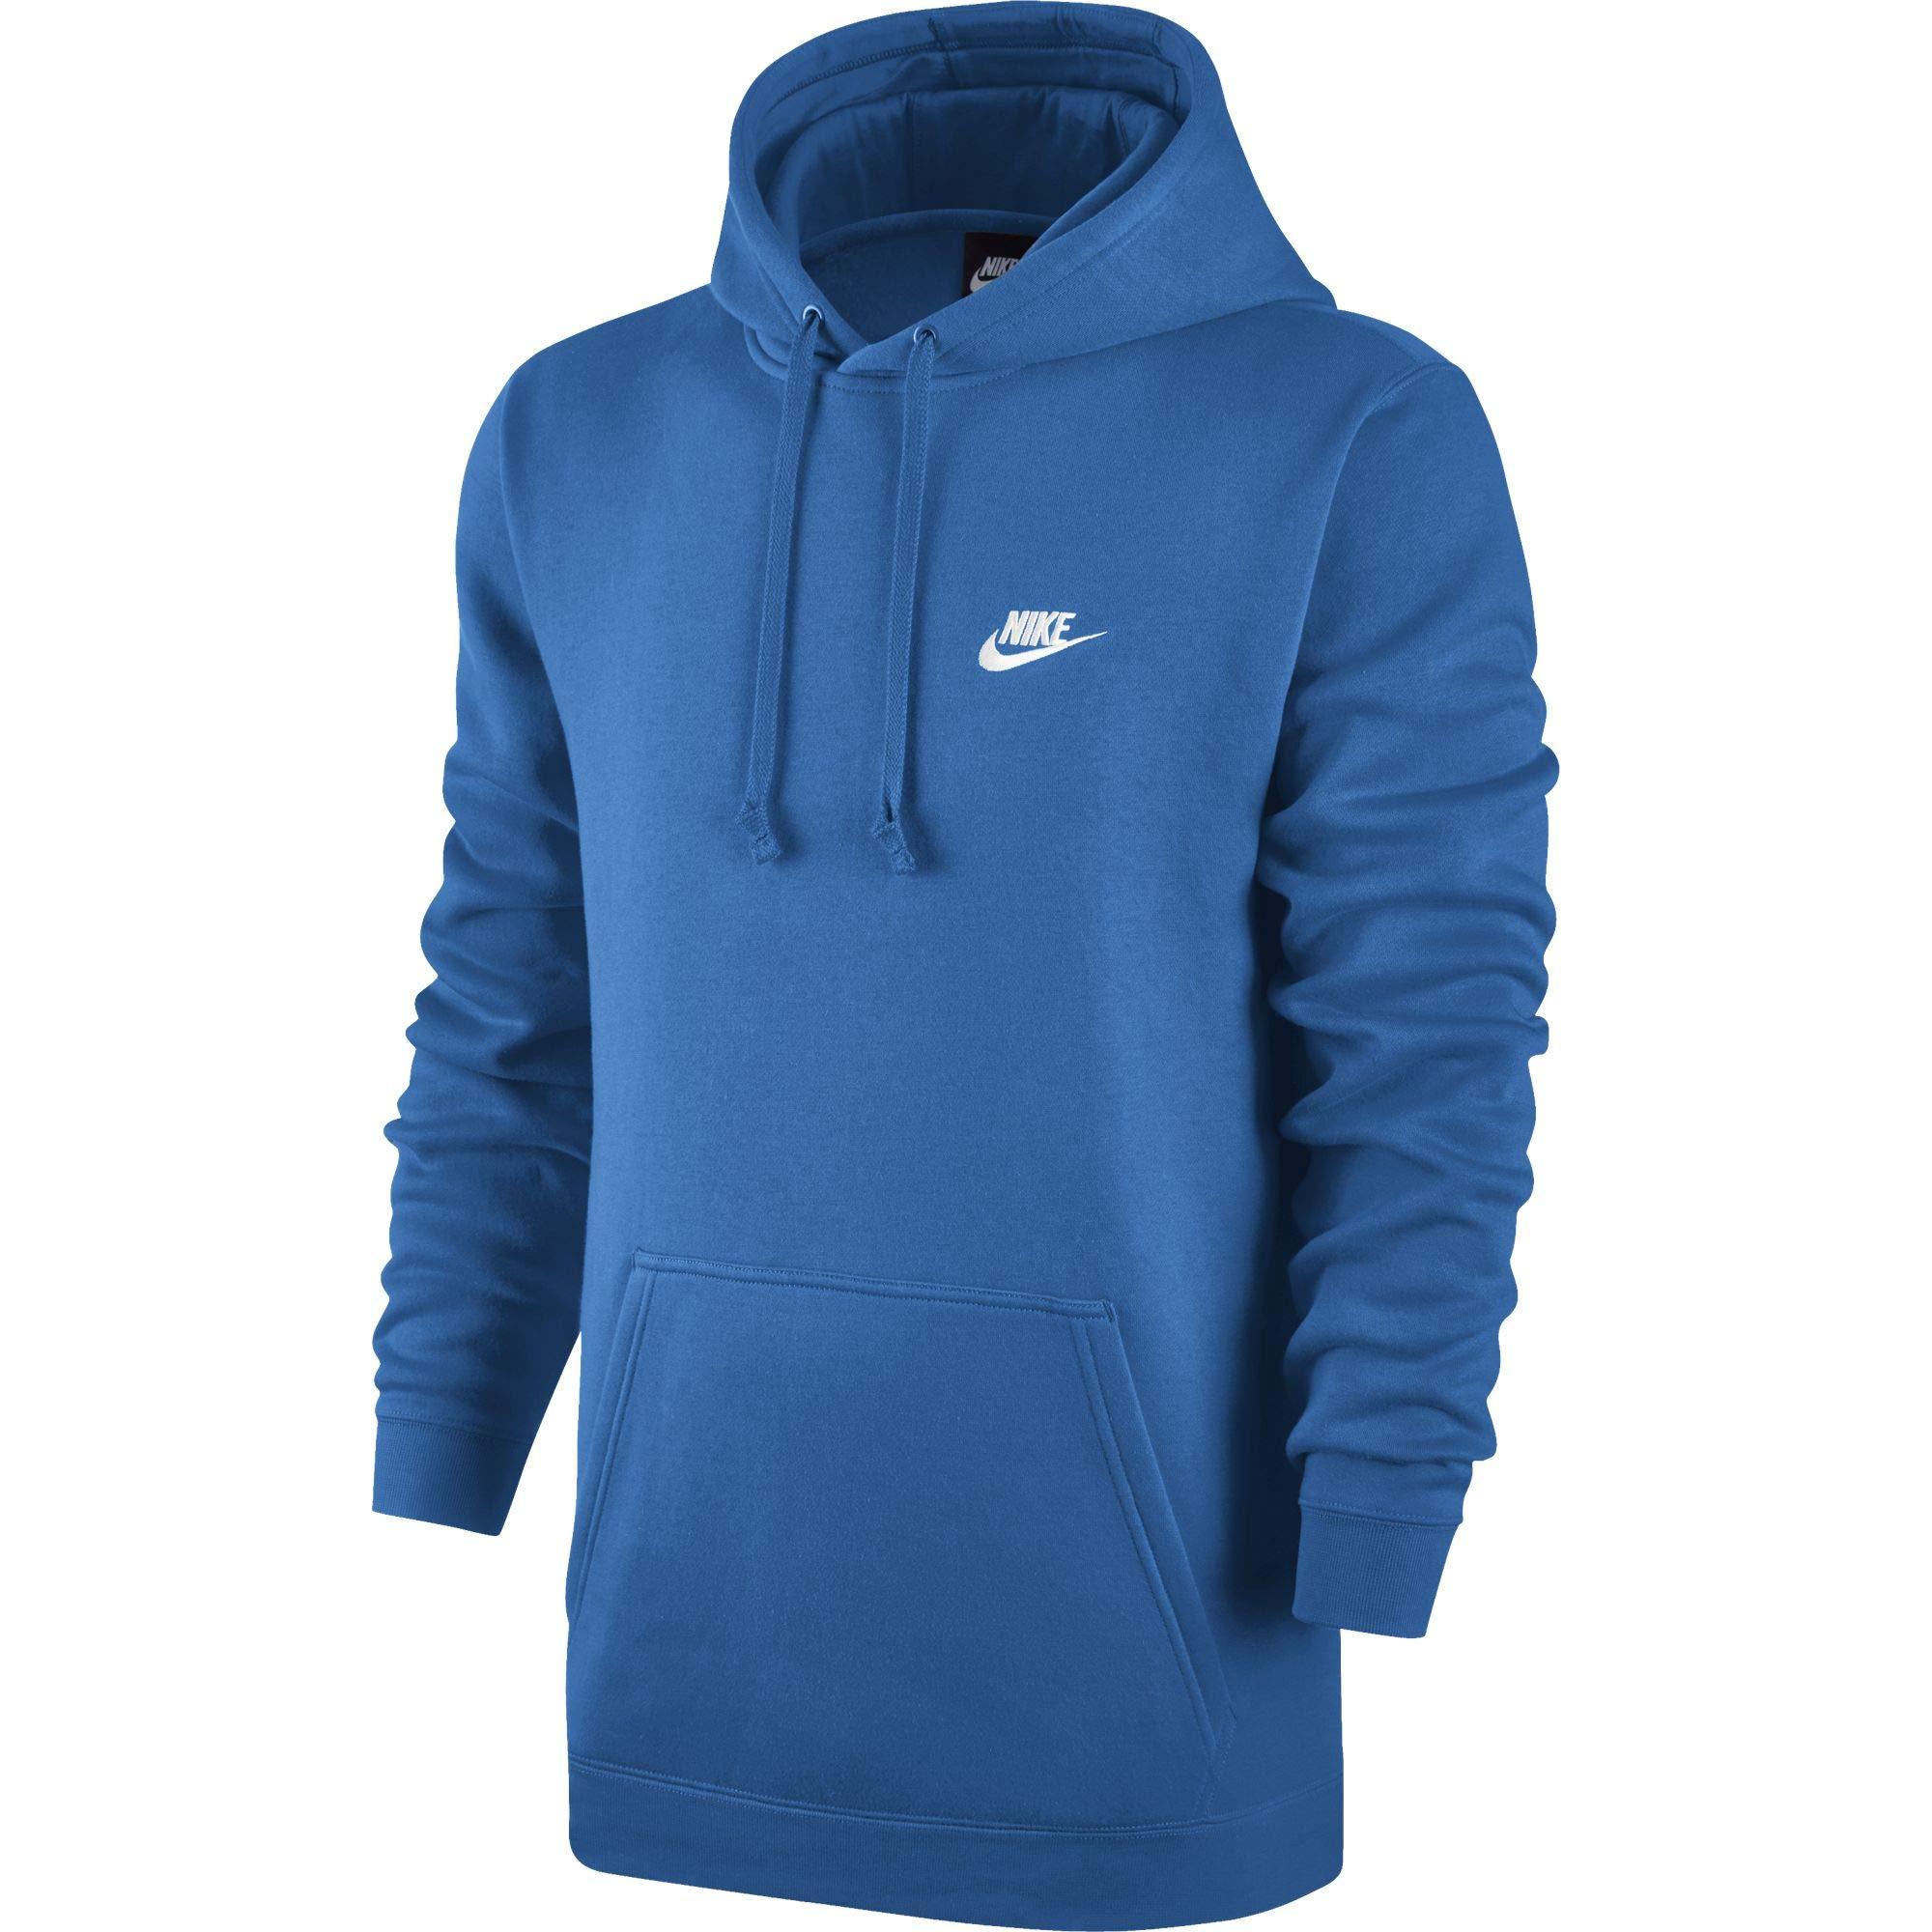 NIKE Club Fleece Men's Pullover Hoodie Signal Blue/White 804346-403 (Size XS)